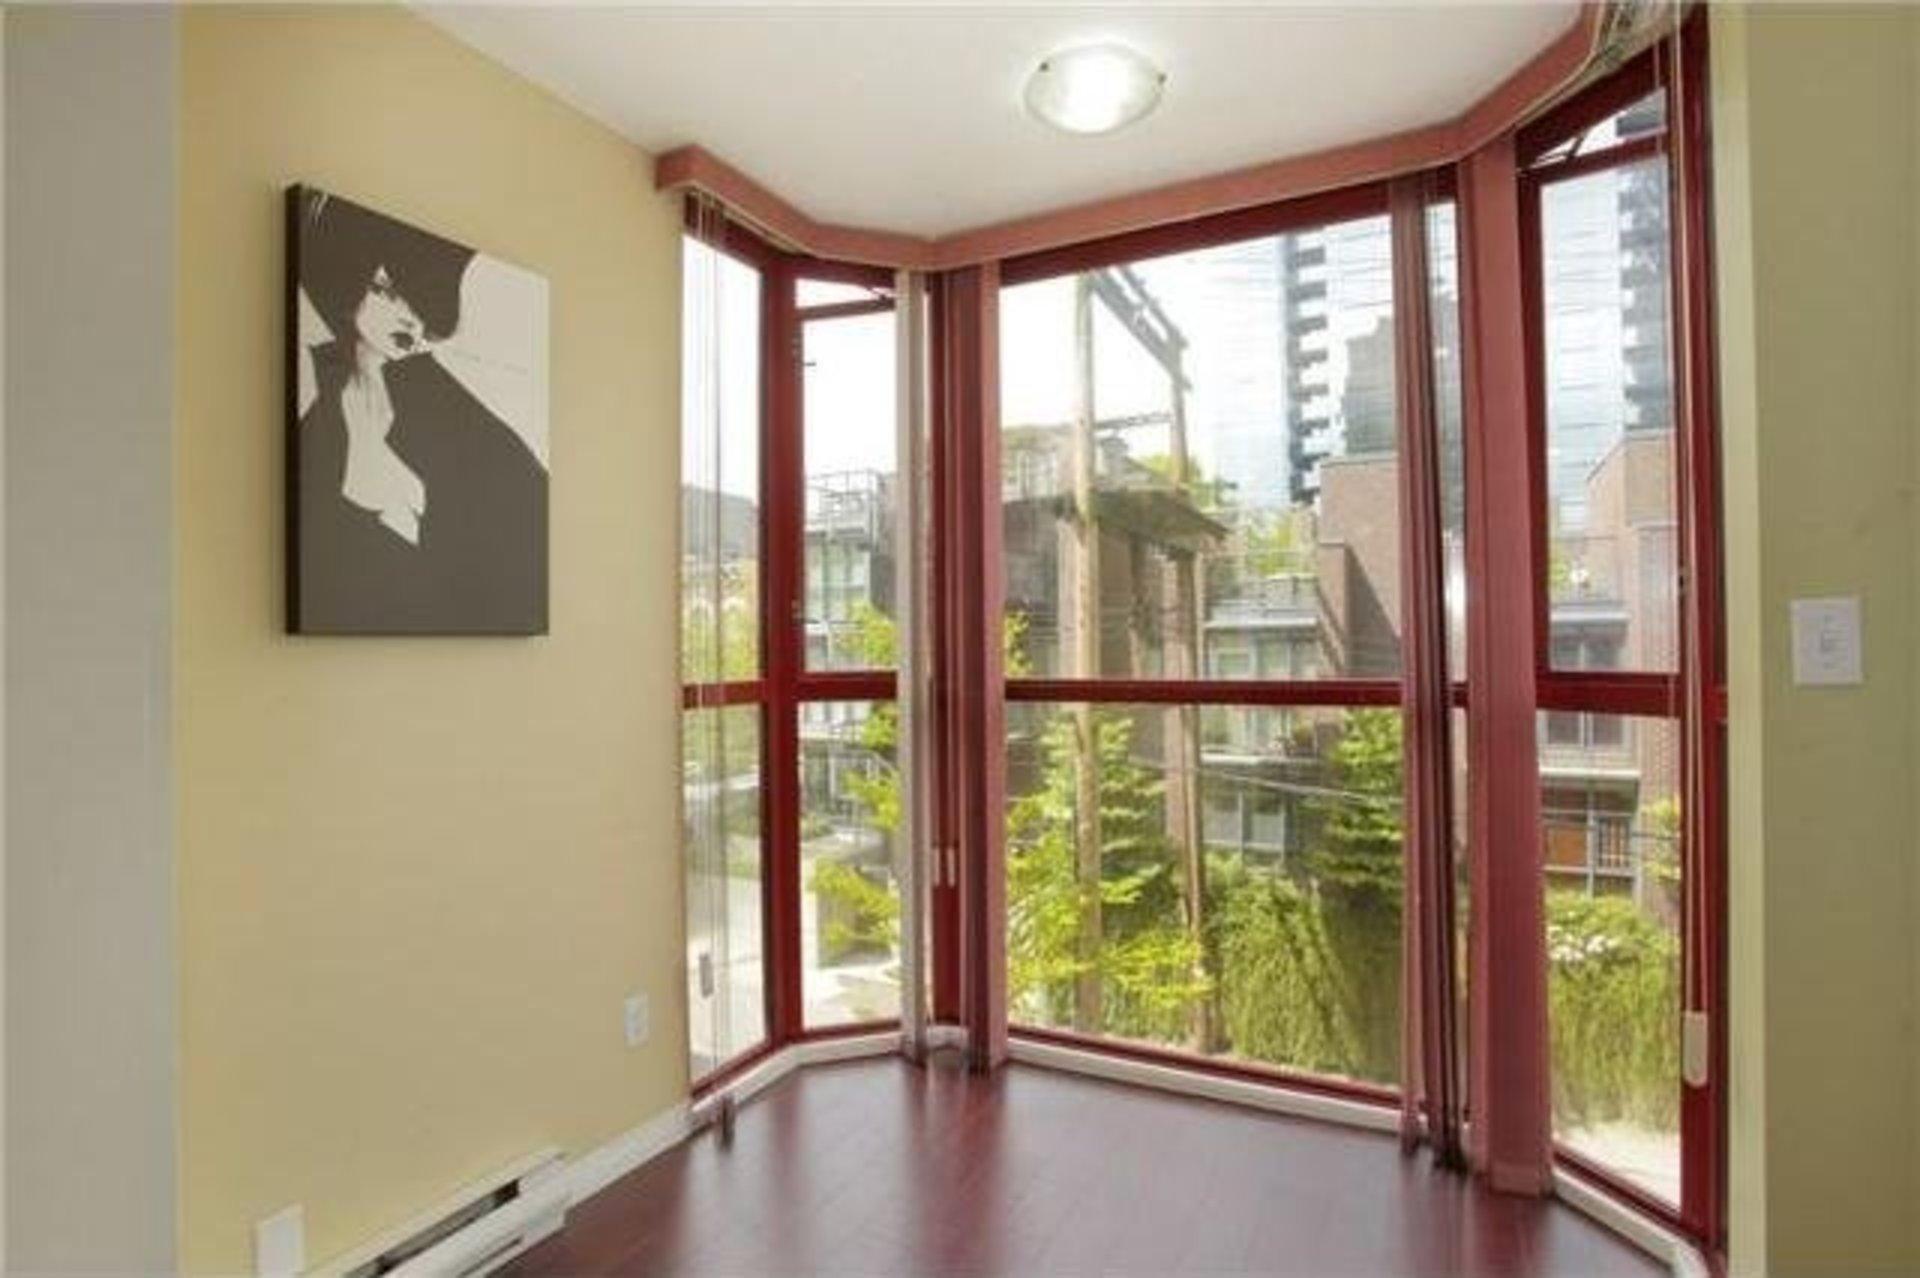 v967493-305-811-helmcken-8 at 605 - 811 Helmcken Street, Vancouver West